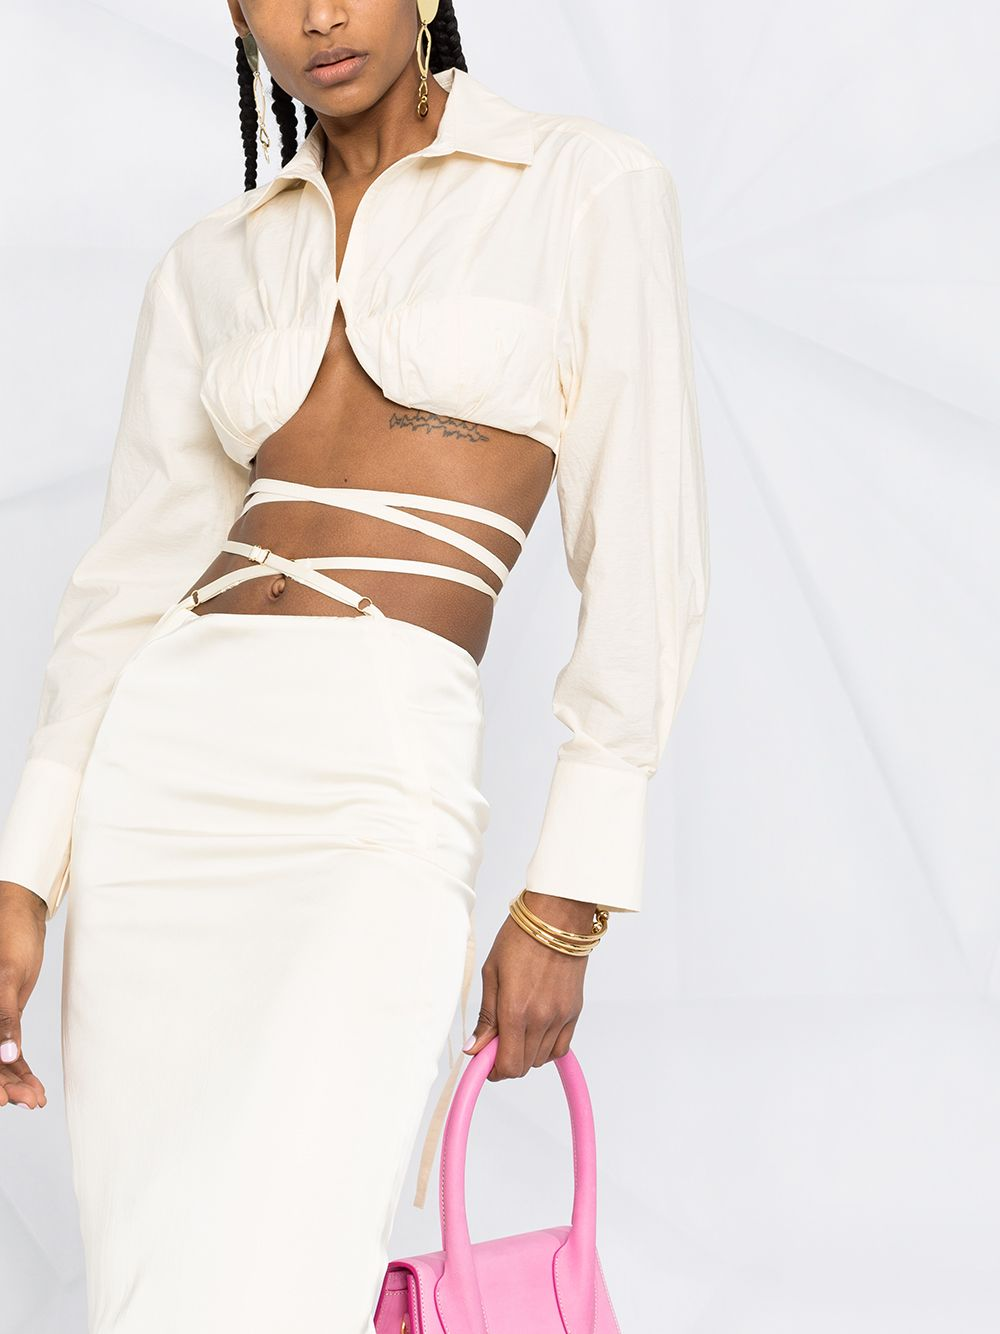 Kim Kardashian rocking khakhi baggy cargo pants with side pockets